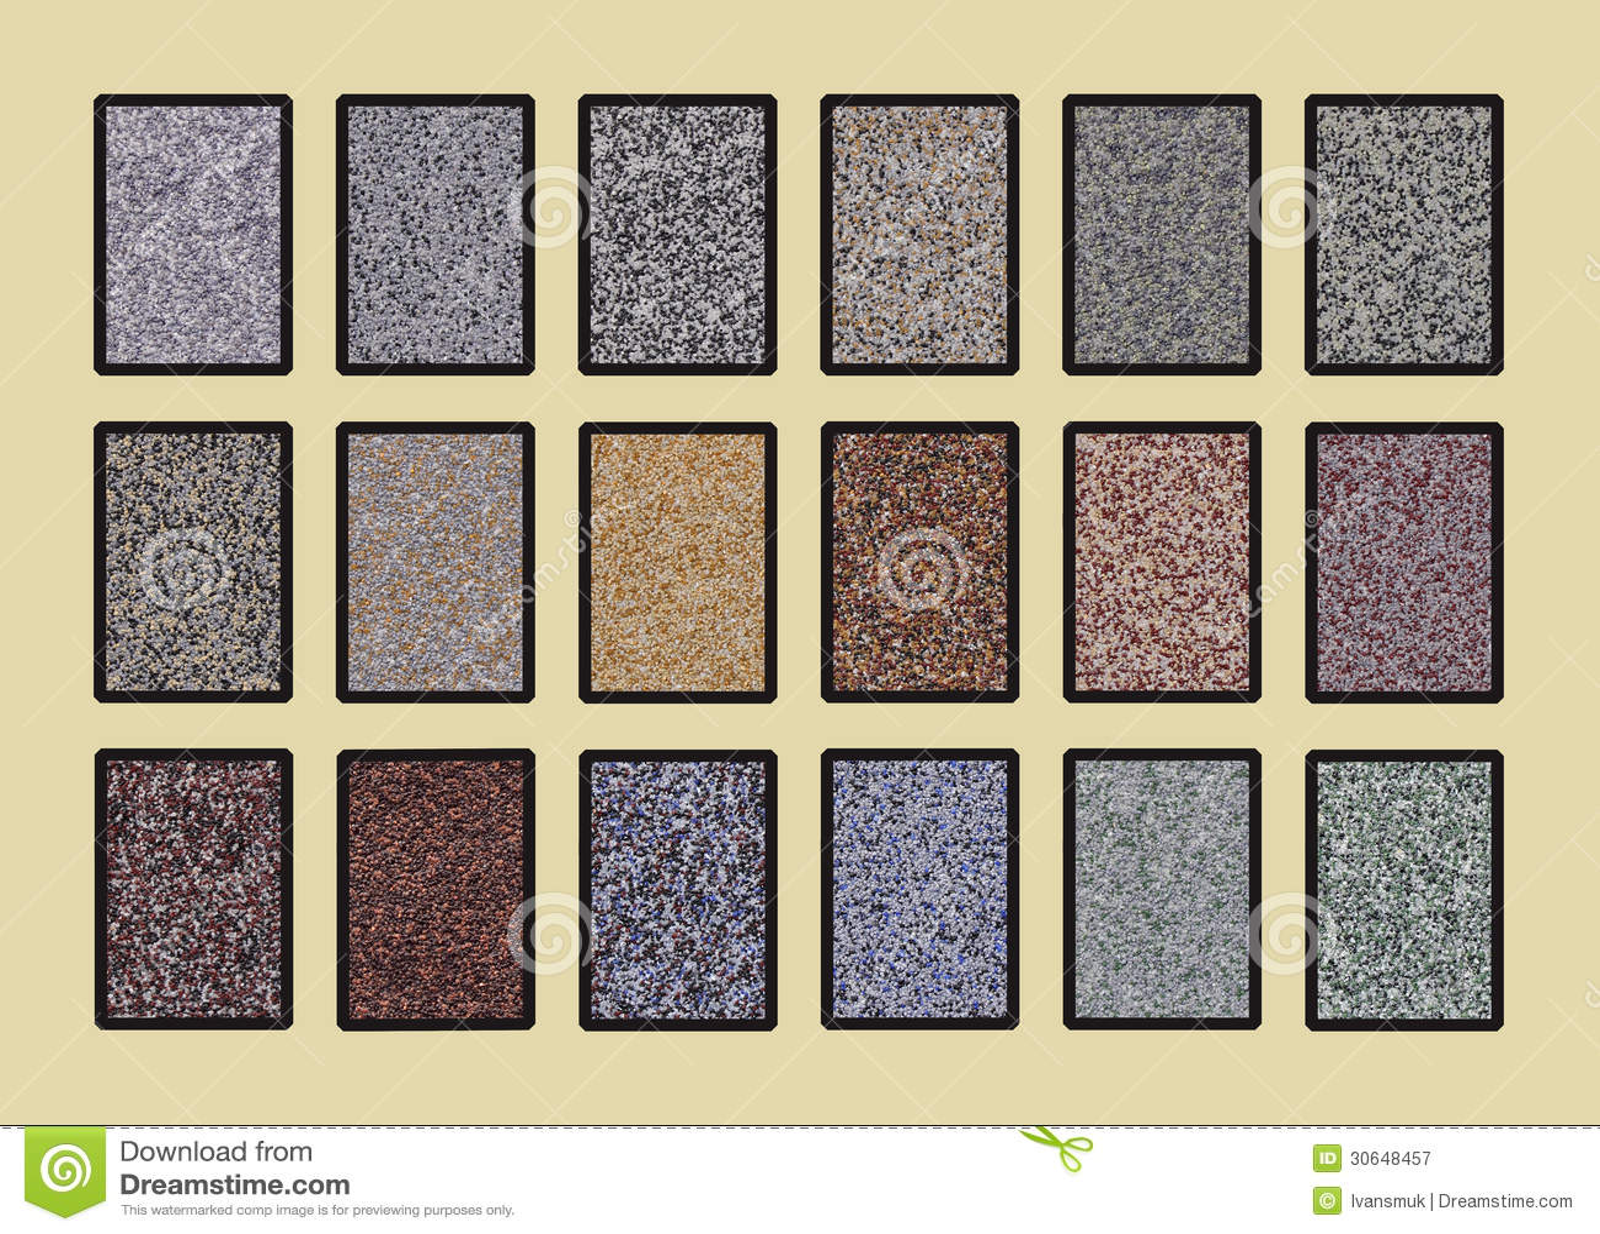 fassadenfarbe lizenzfreie stockfotografie bild 30648457. Black Bedroom Furniture Sets. Home Design Ideas